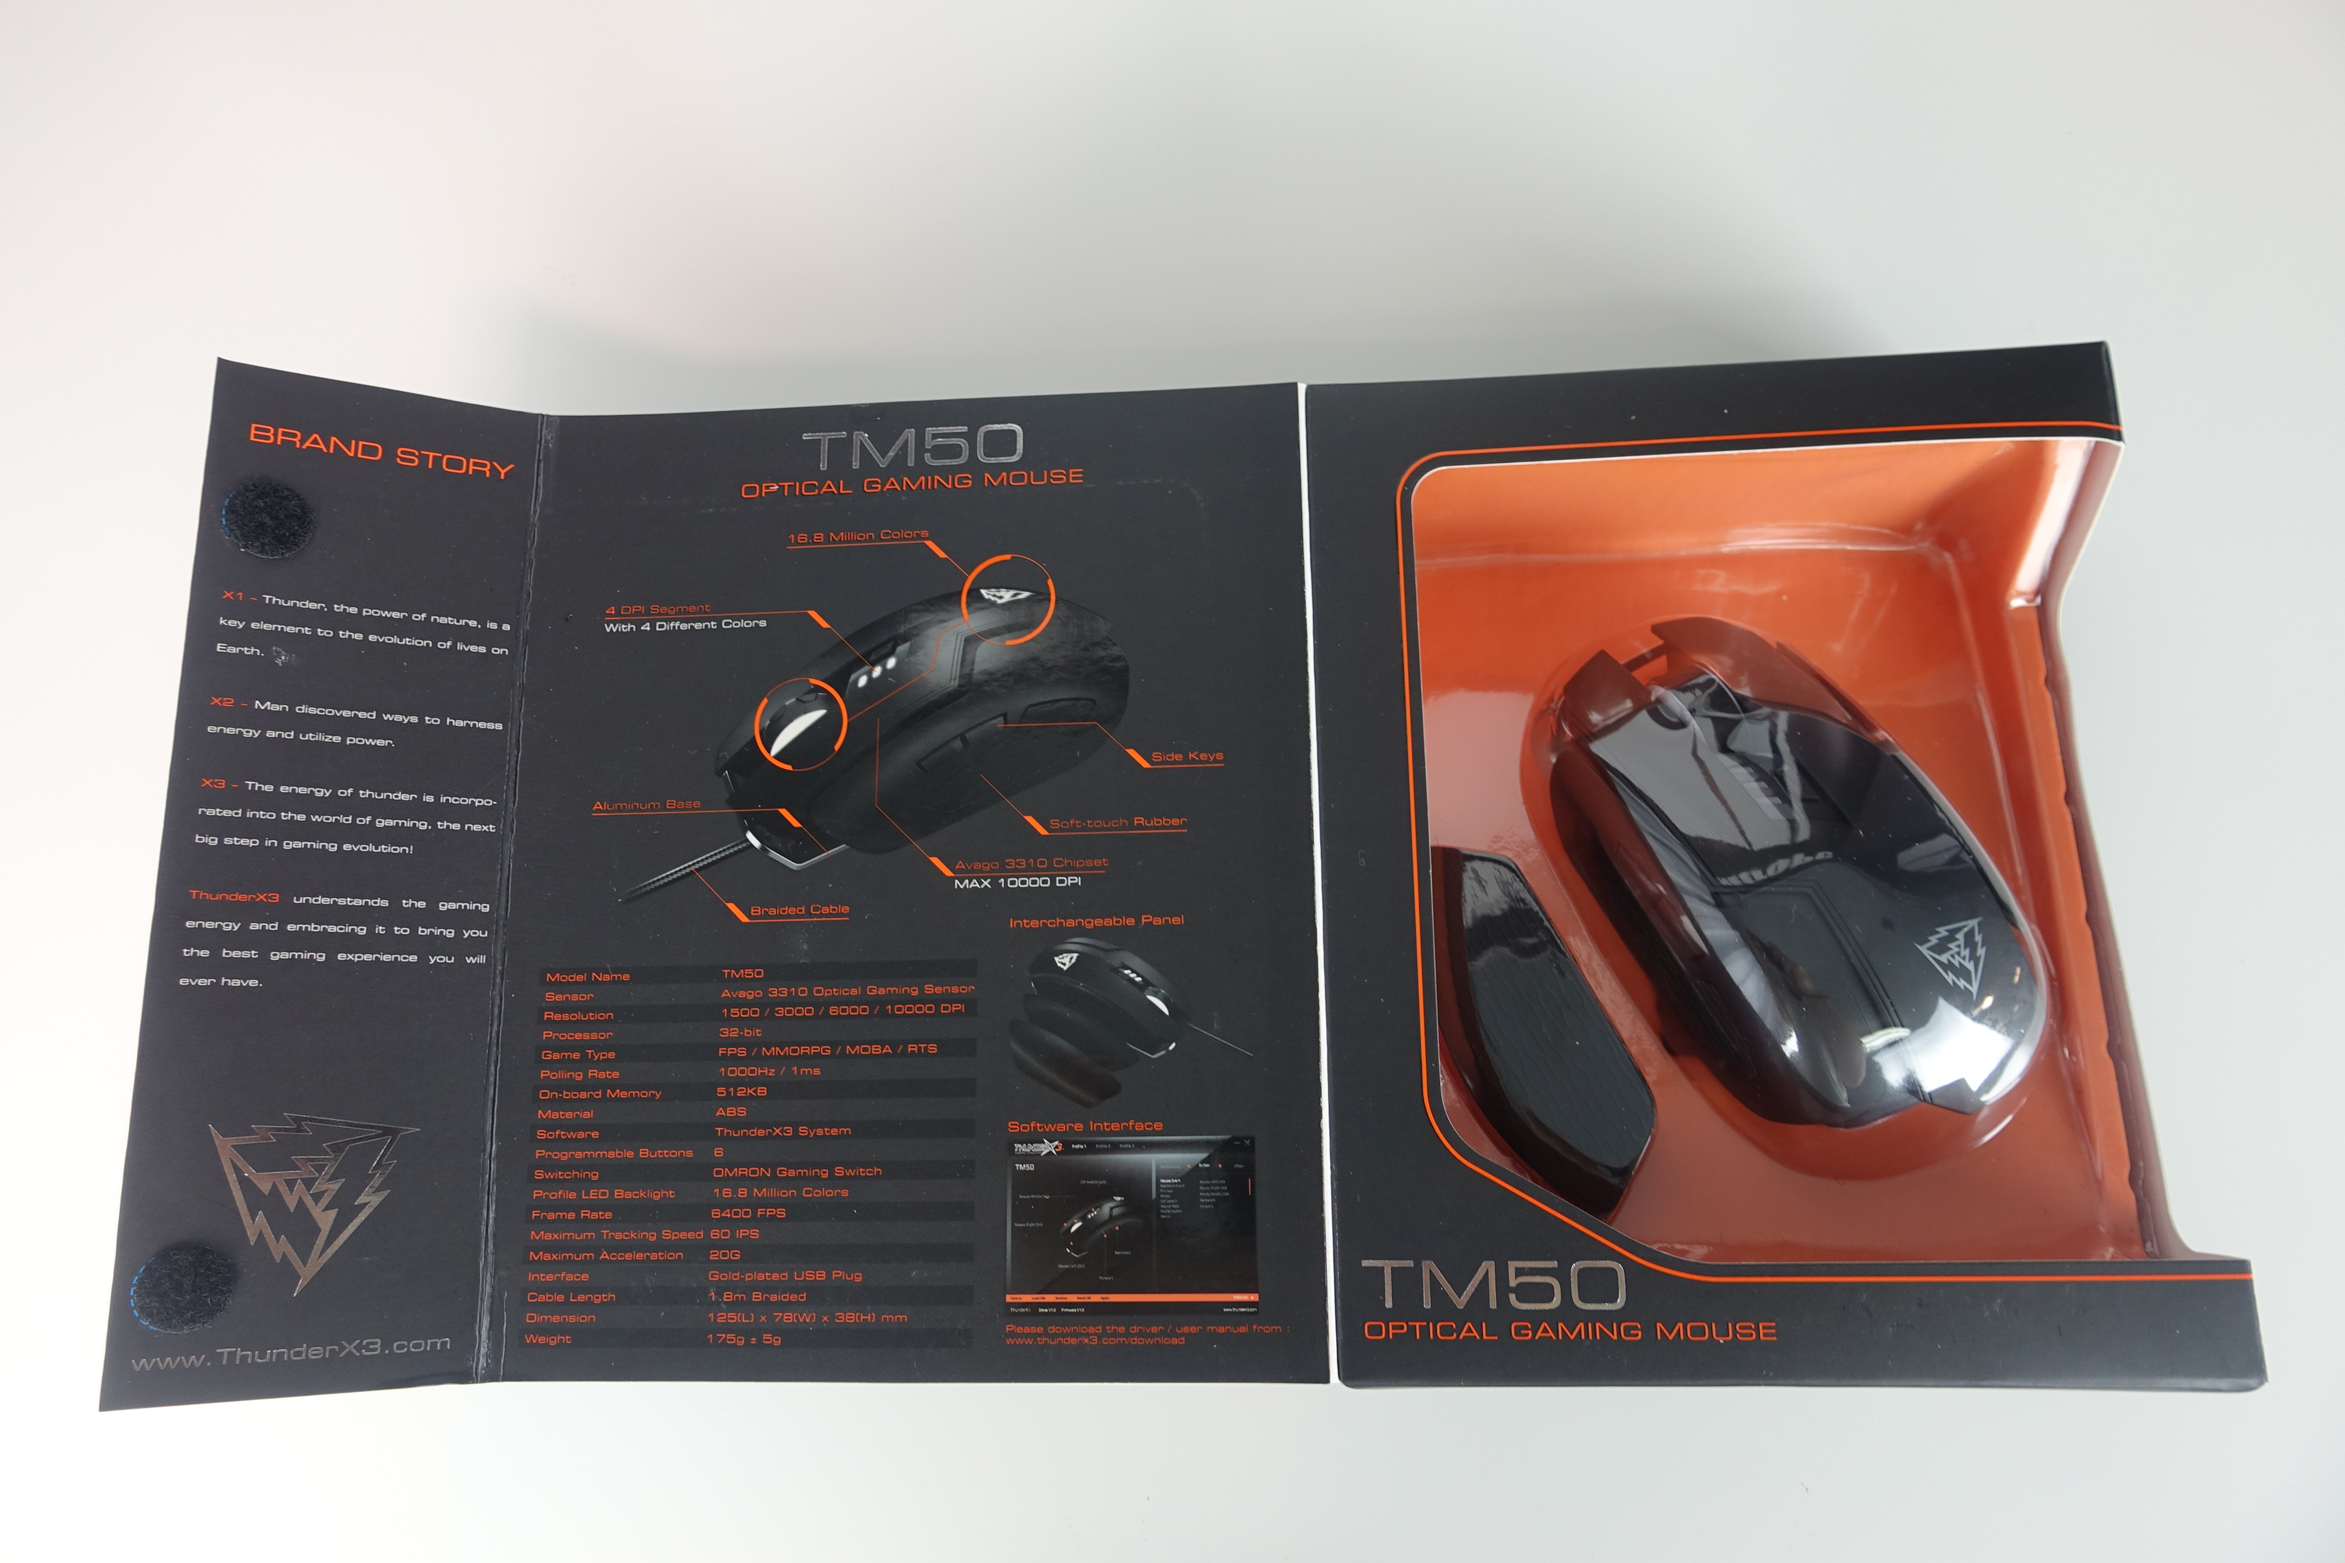 TM50-7